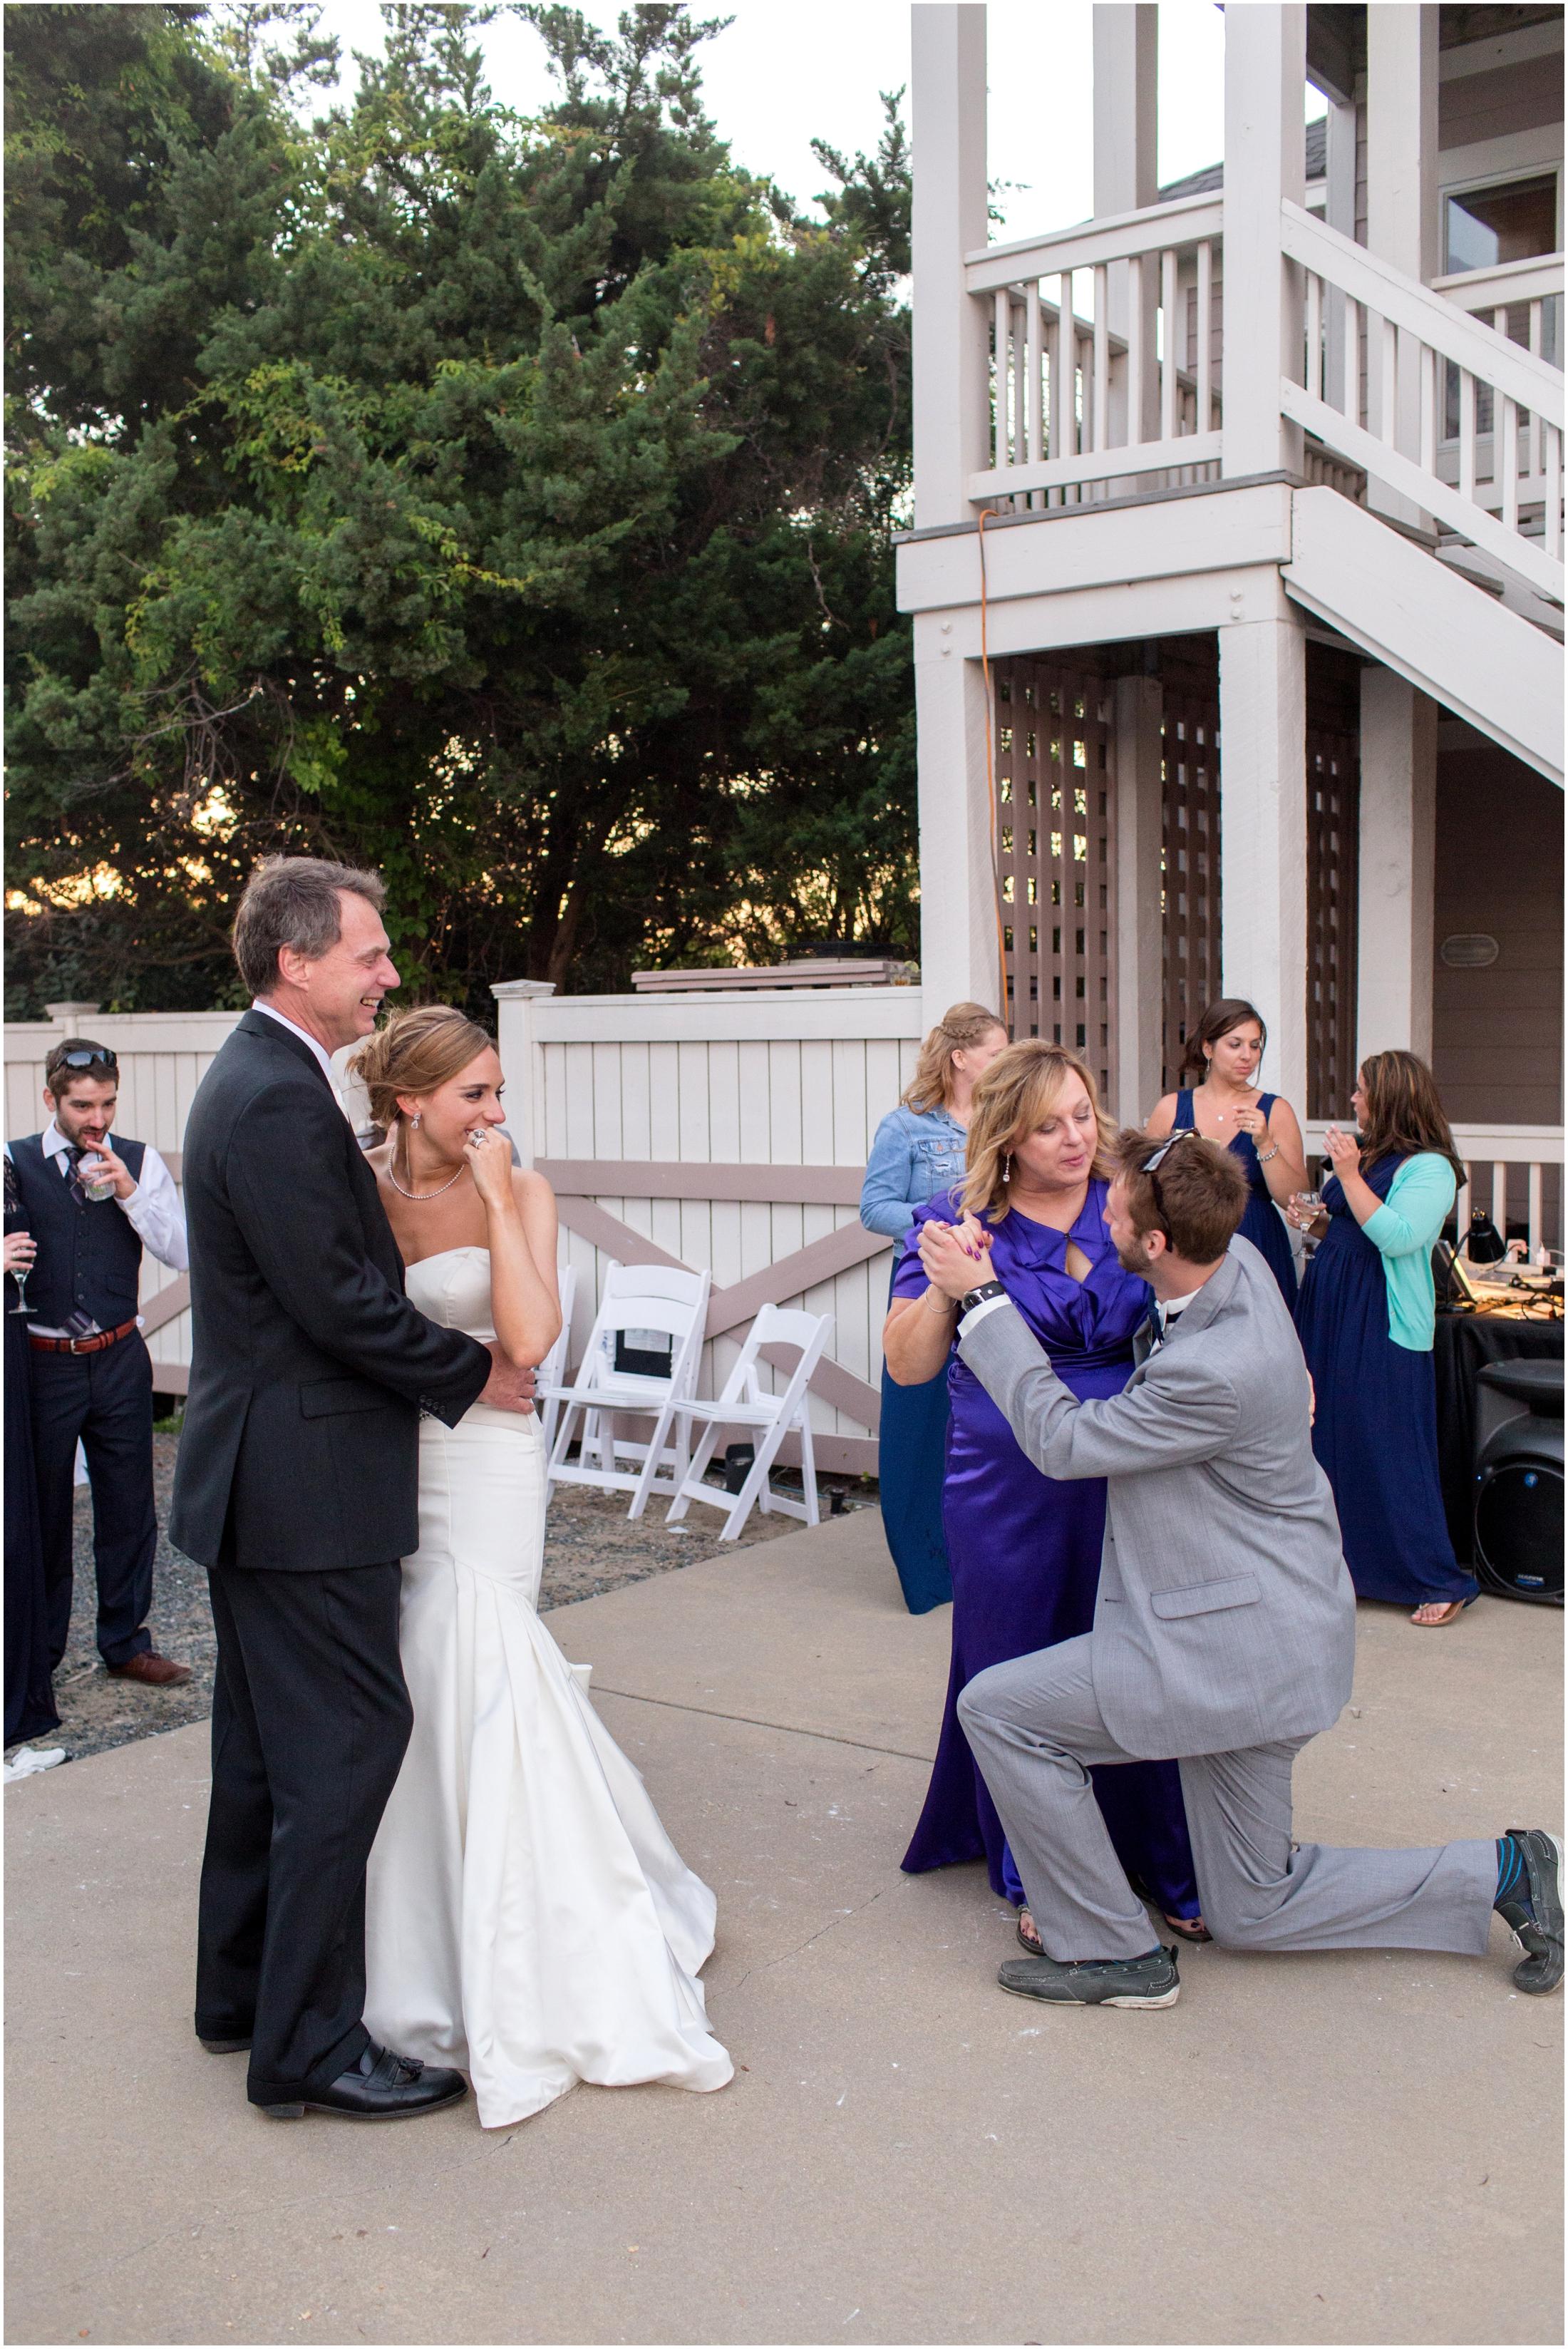 Pearce-Wedding-Reception-1134.jpg